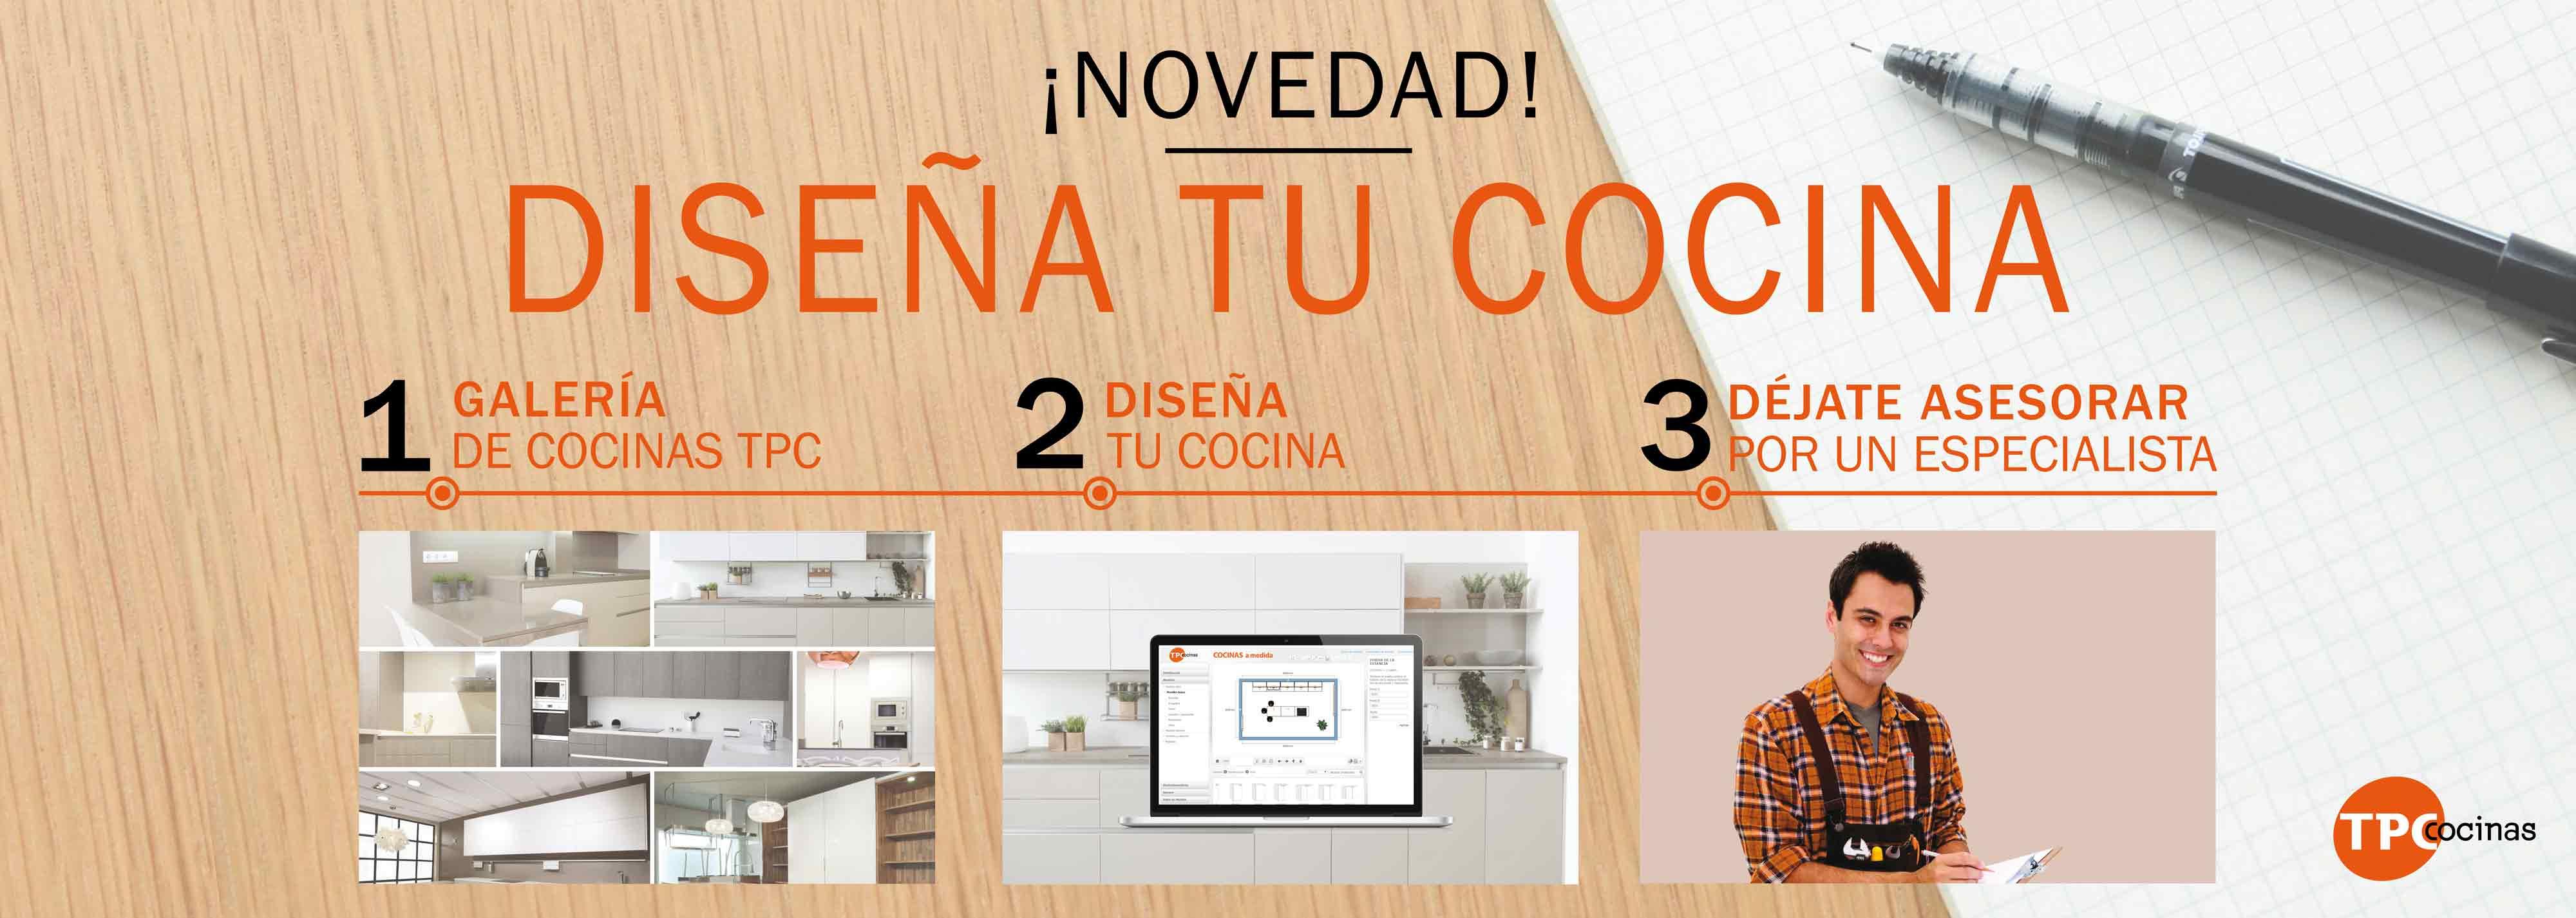 Tpc cocinas dise ador 3d - Disenador de cocinas online ...